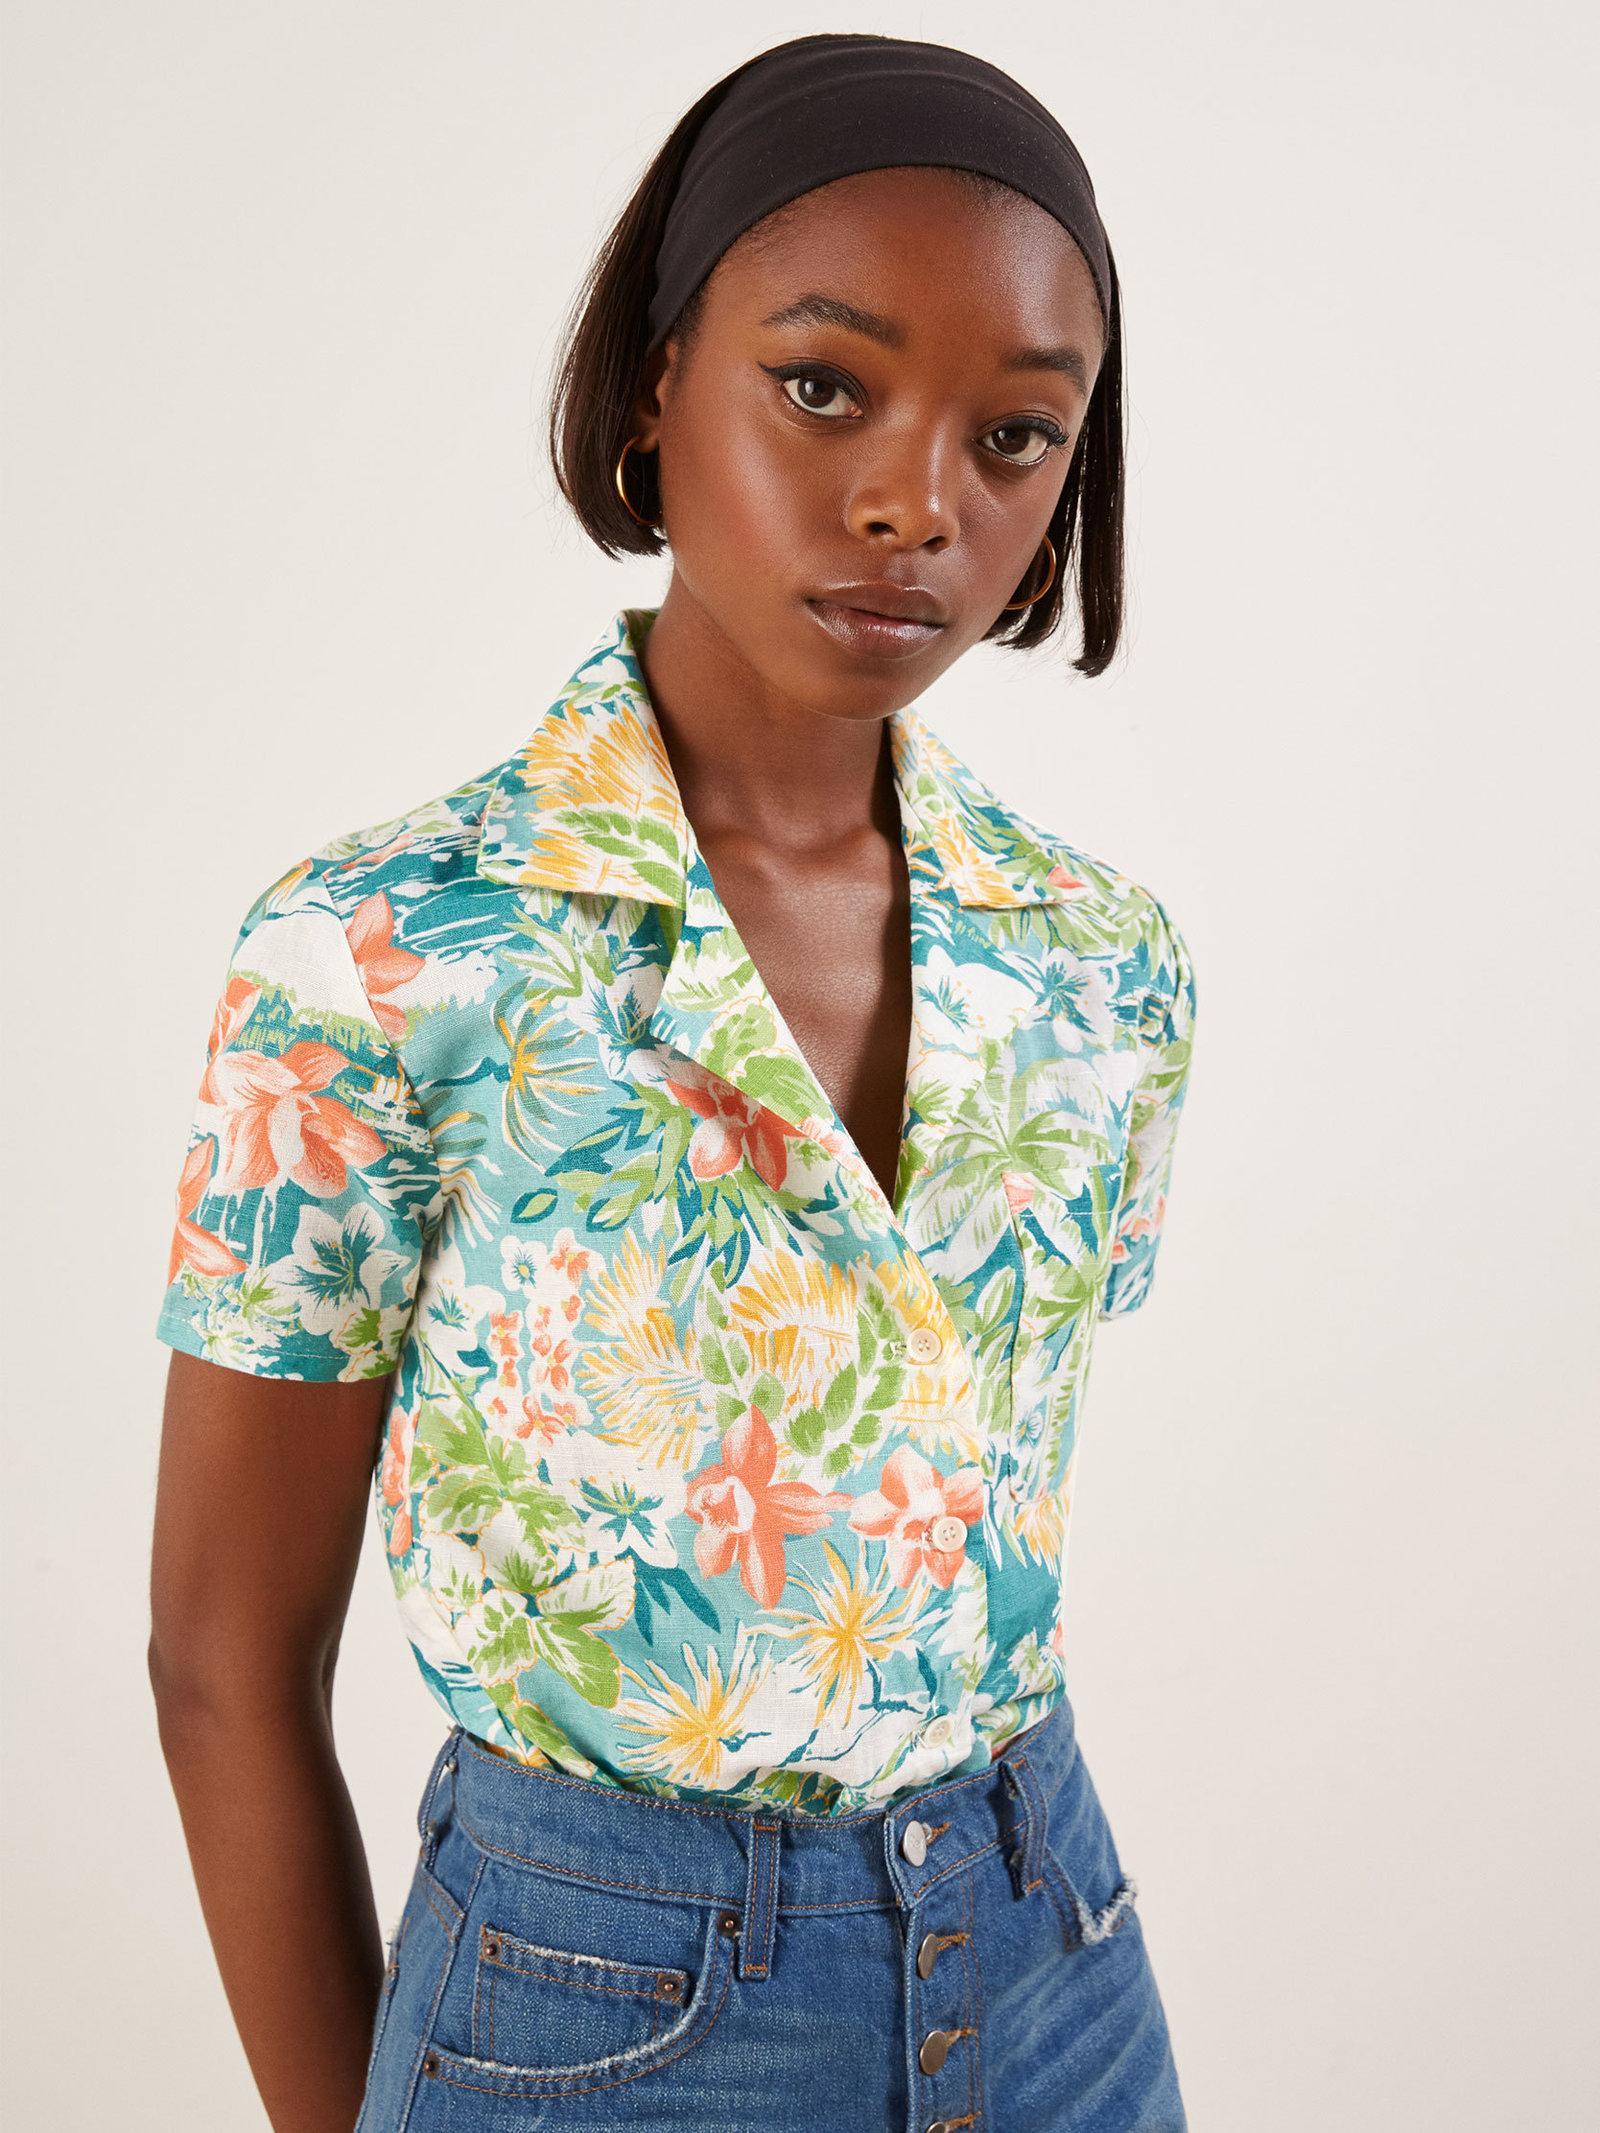 Hawaiian Shirts For Women - A Fashion Statement in Your Own Skin Tone